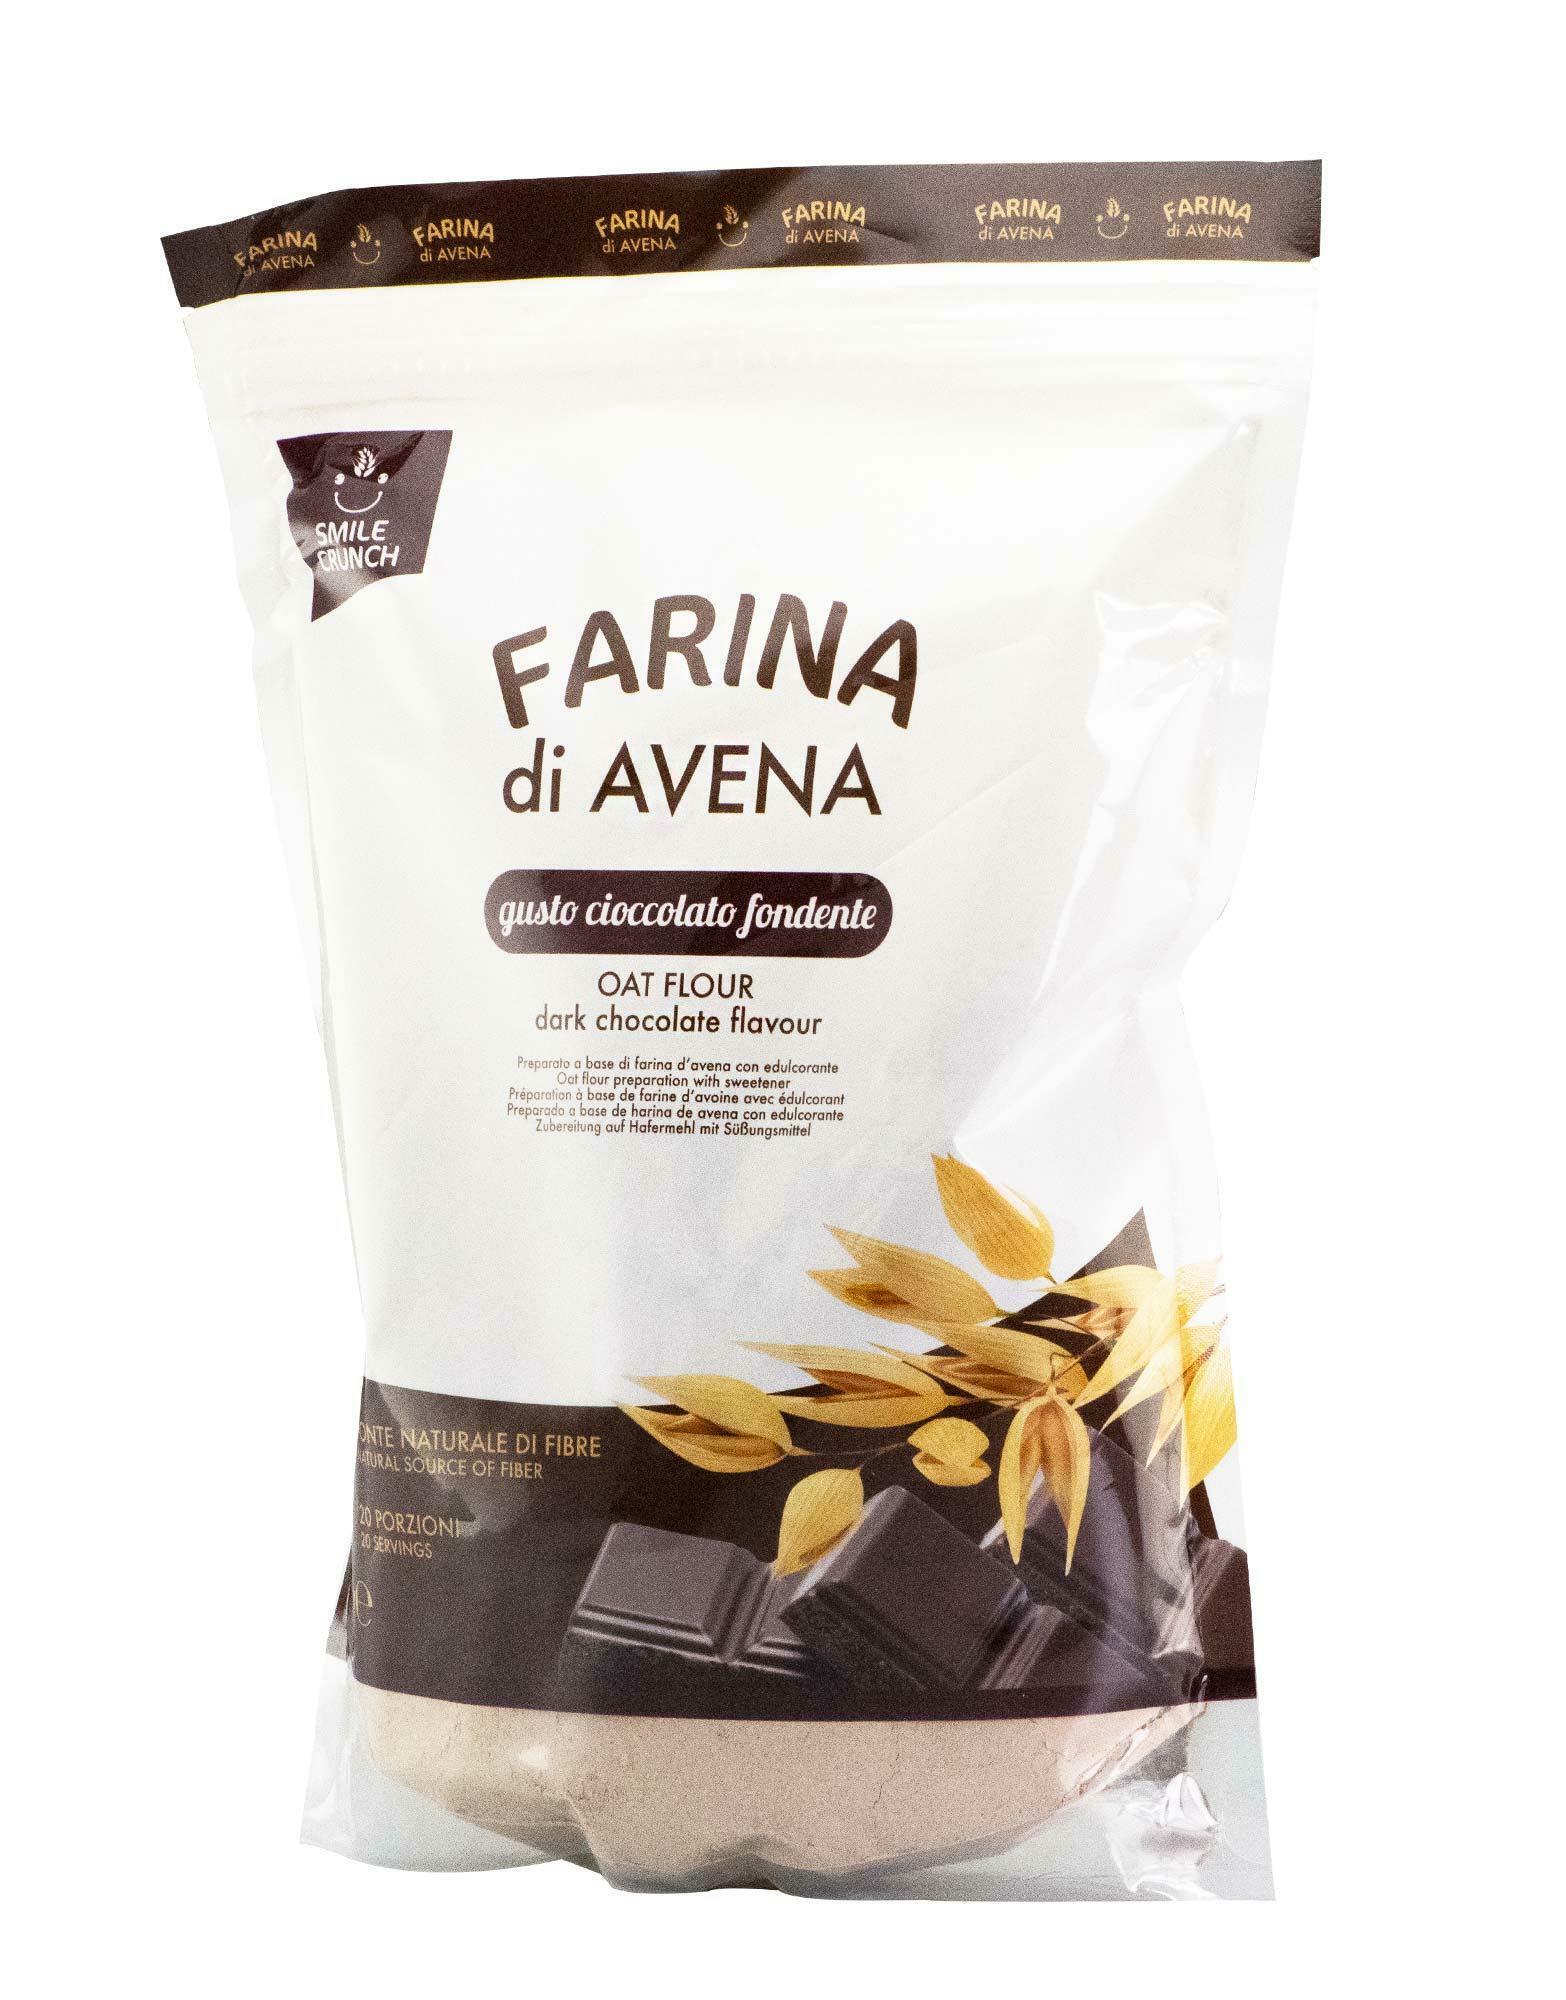 smile crunch oat flour - farina d'avena istantanea gusto cioccolatte - 1kg